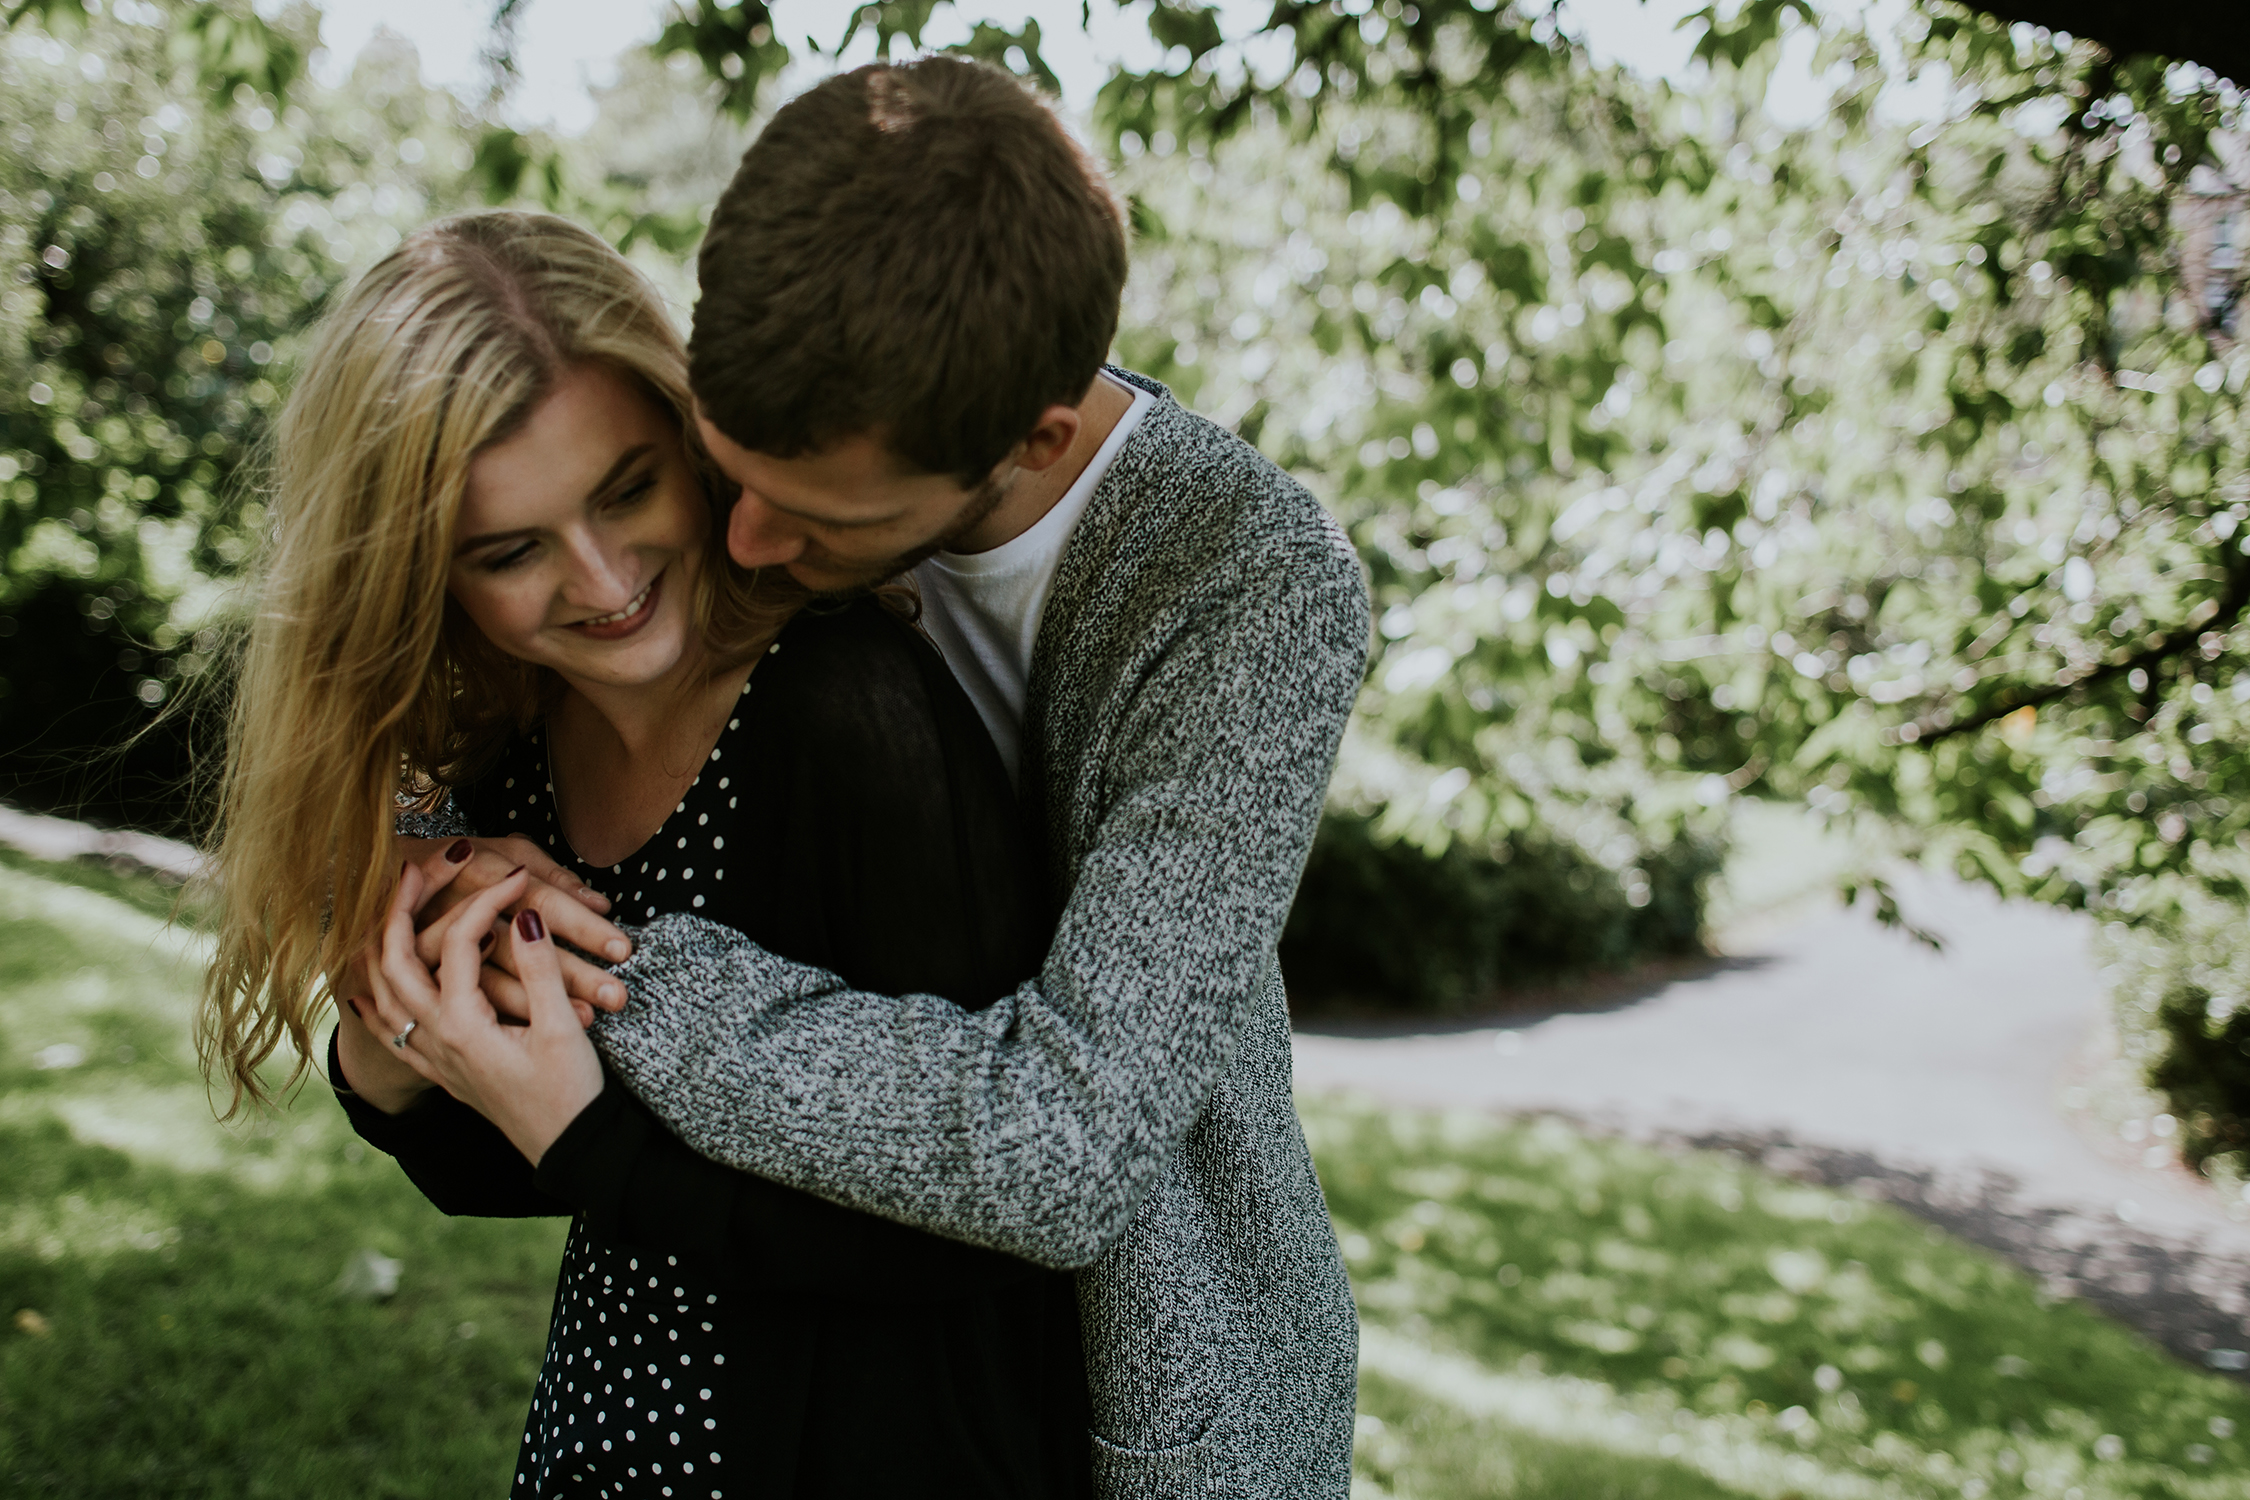 romantic_city_elopement_glasgow_edinburgh_wedding_photographer_36